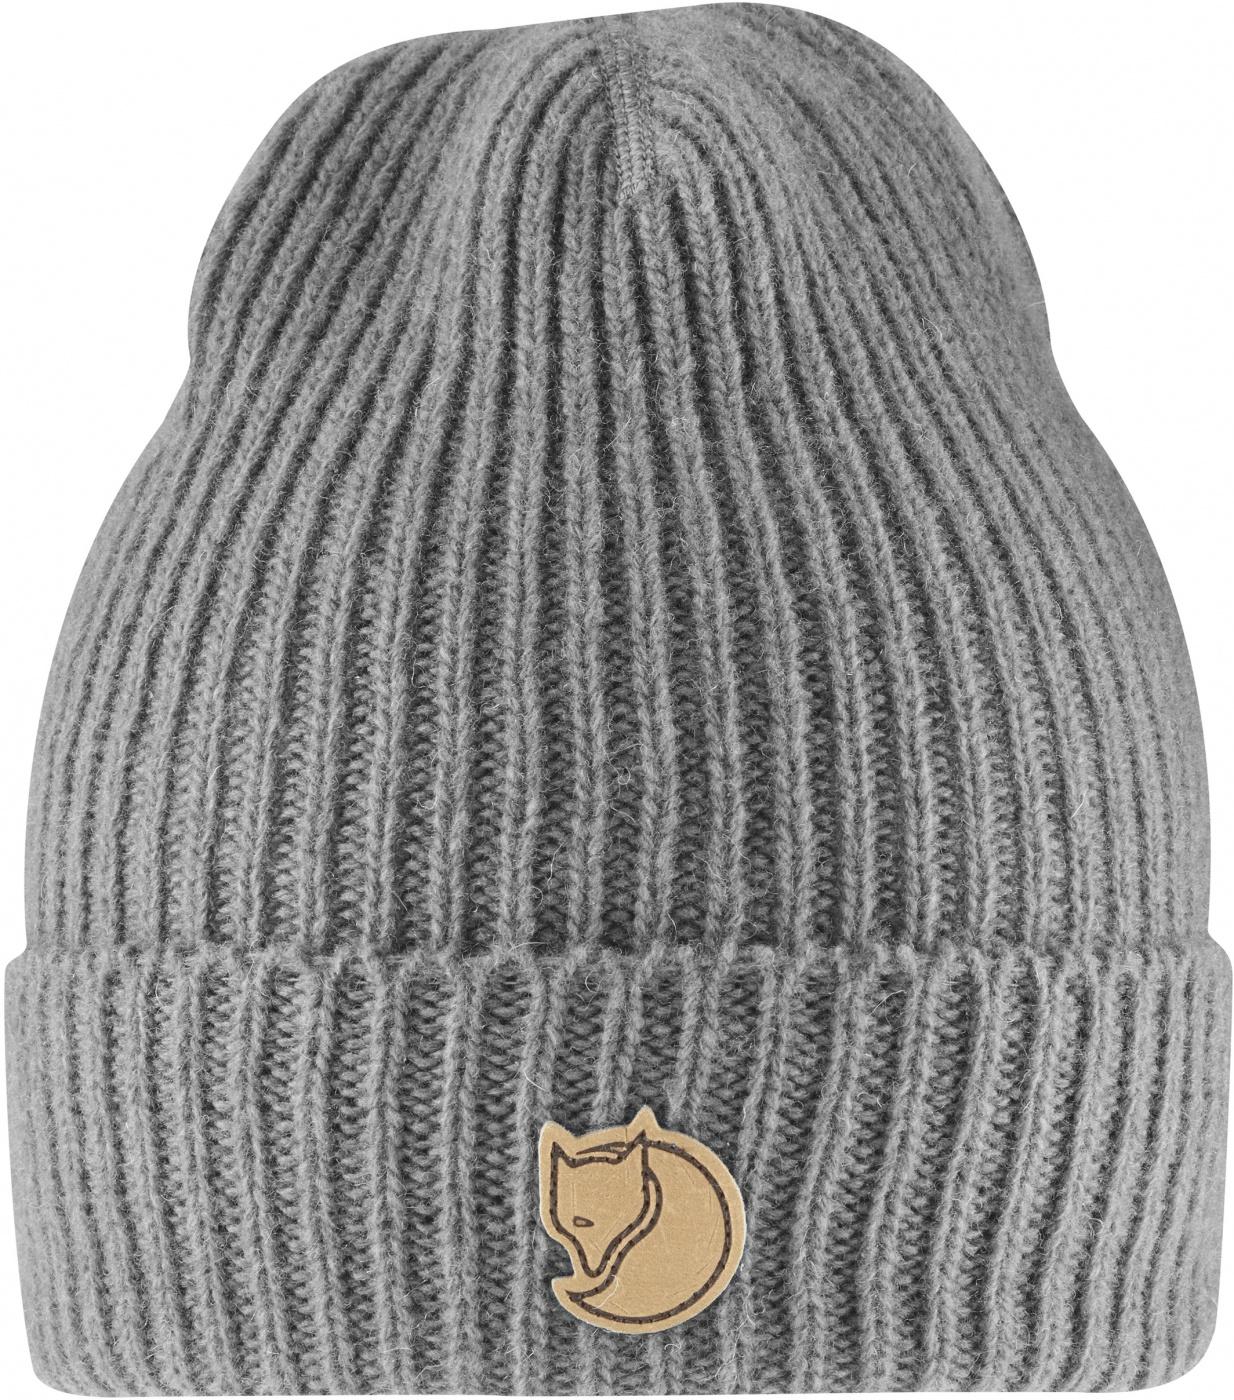 FjallRaven Rib Beanie Grey-30